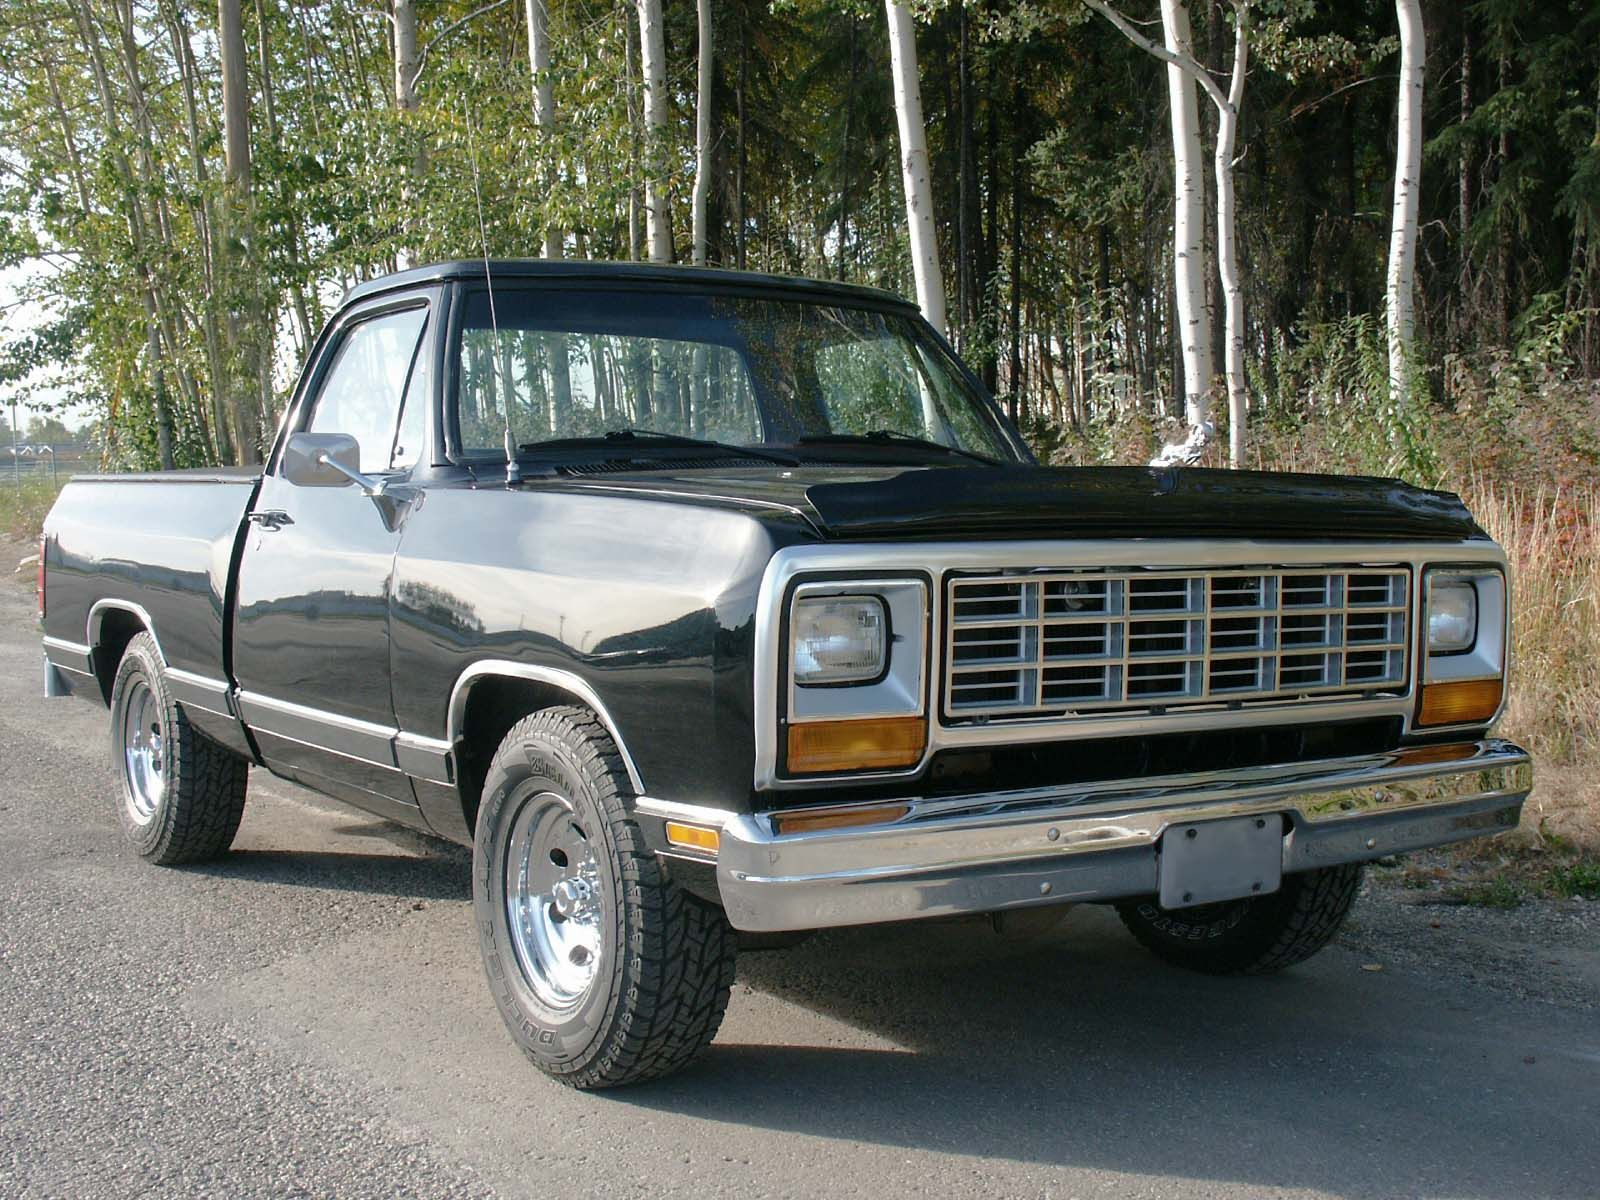 1983 Dodge D150 | Dodge Trucks | Pinterest | Dodge trucks, 4x4 and Cars